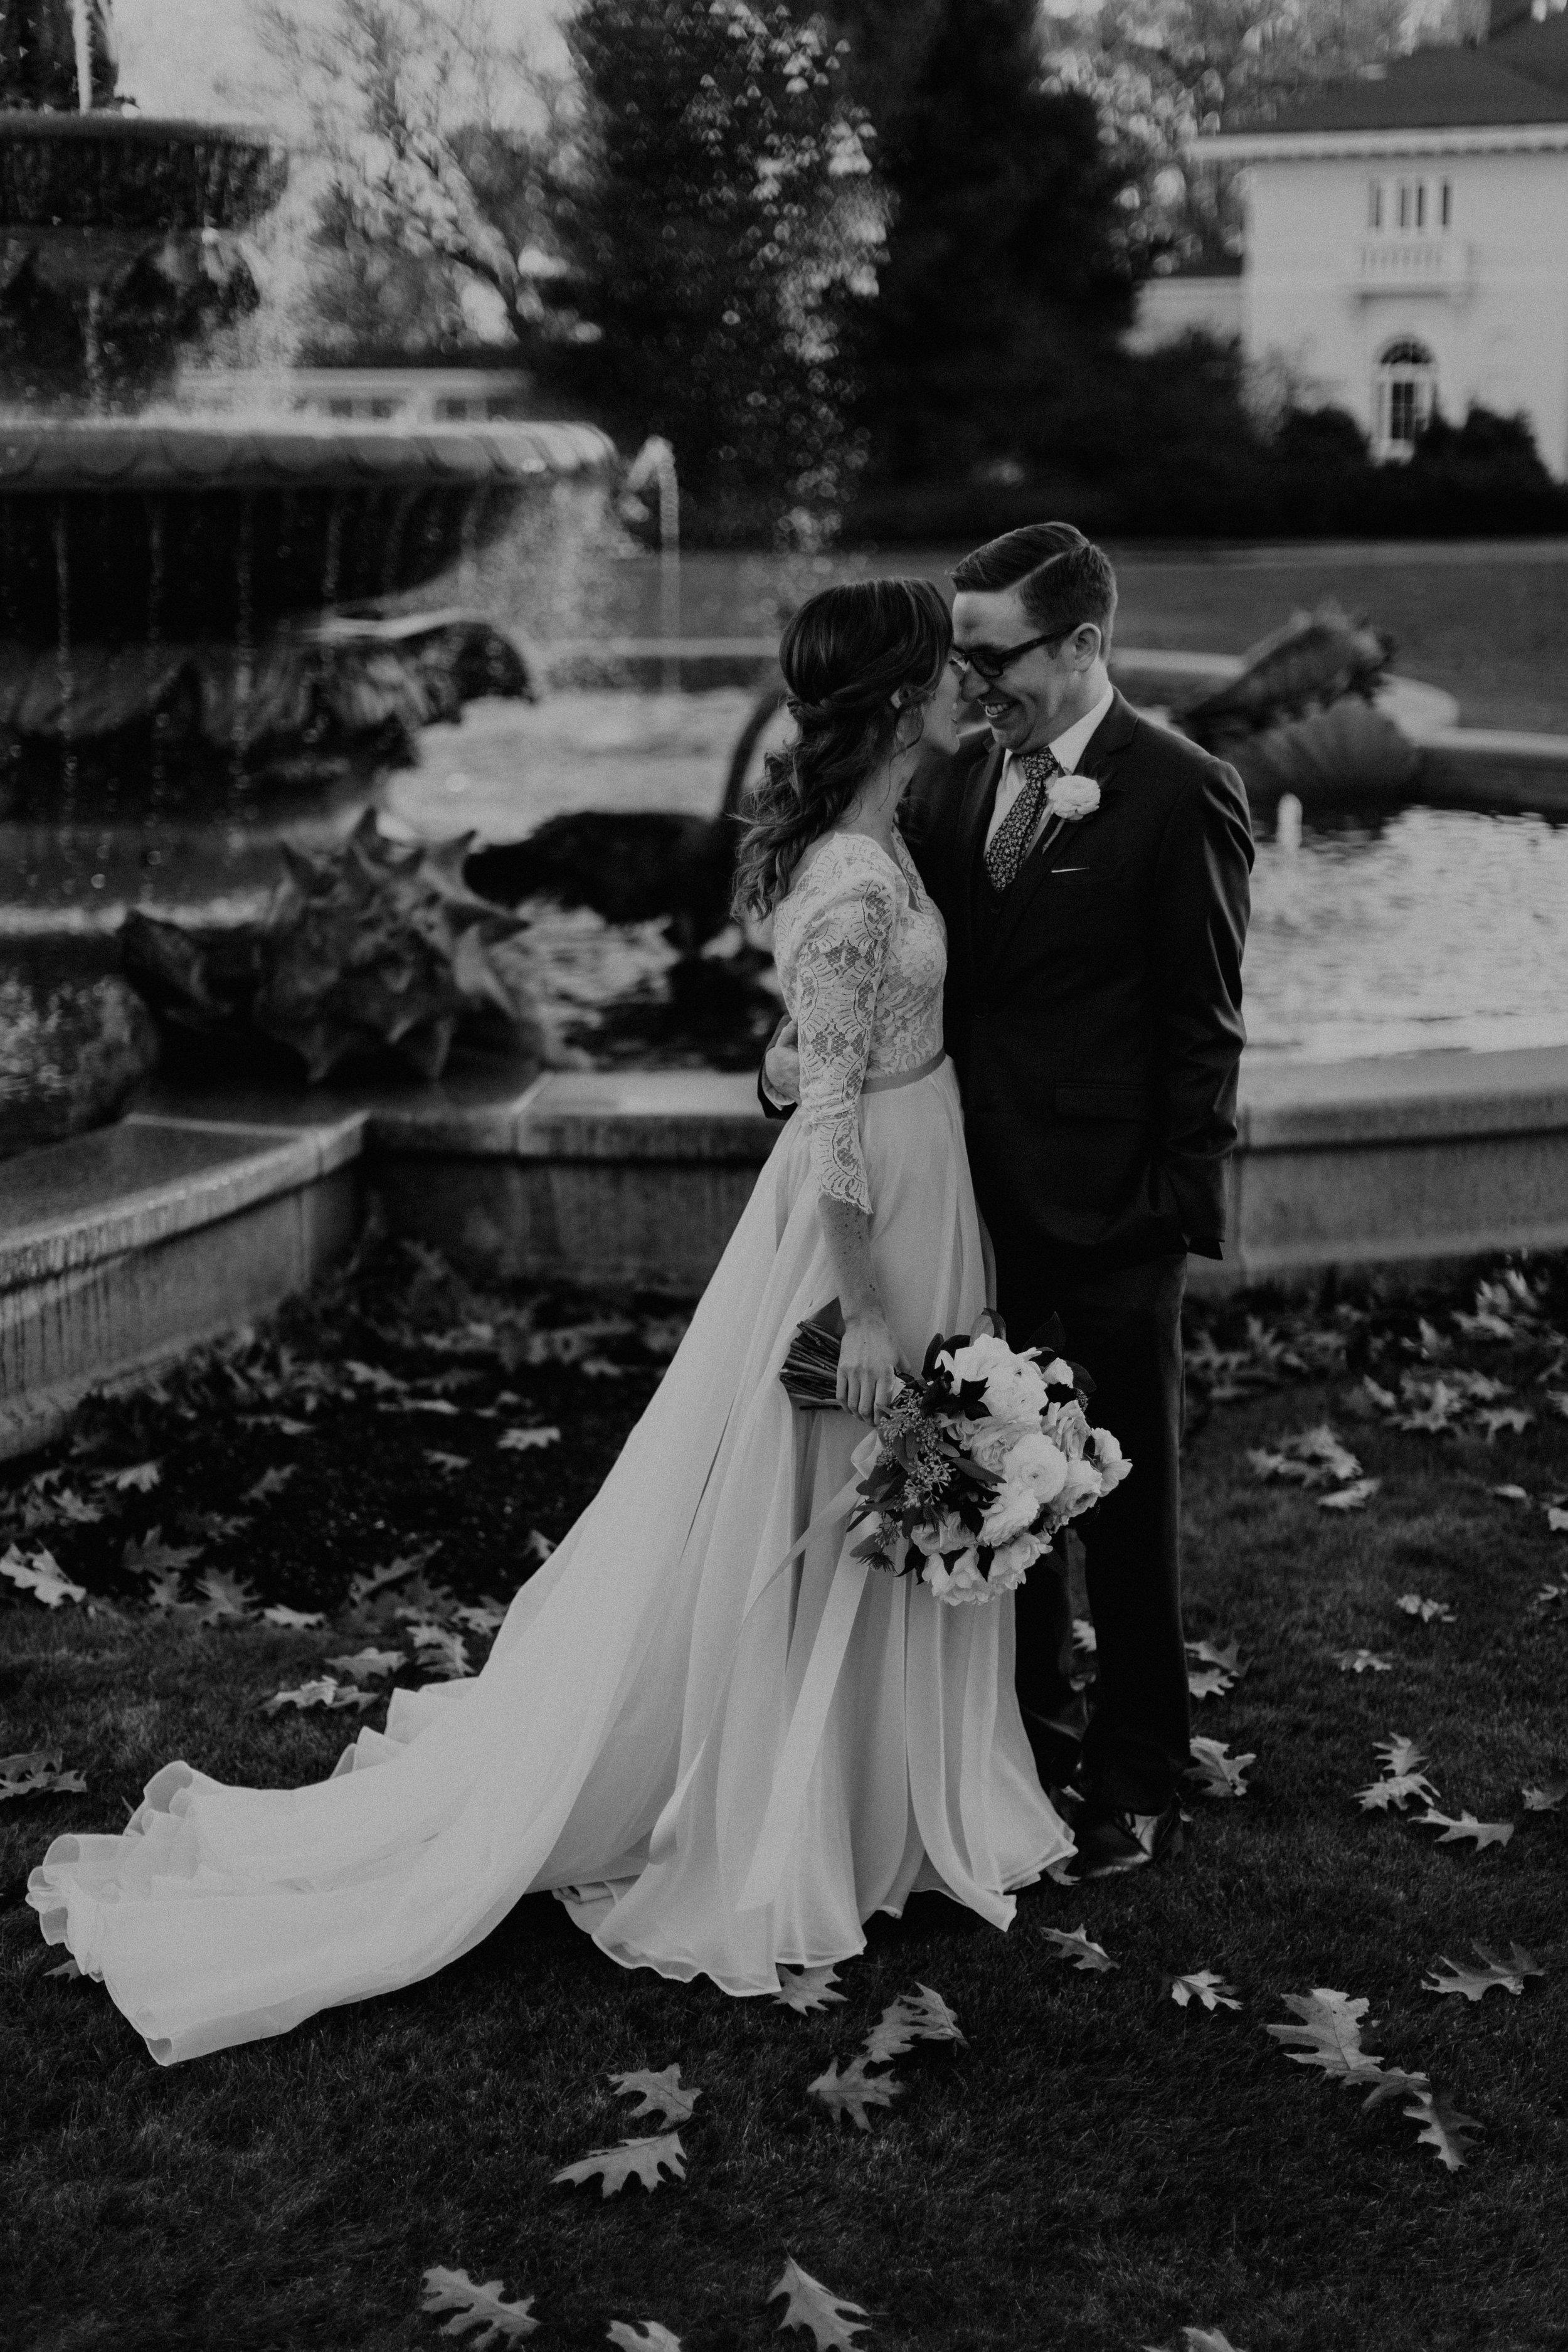 beverly_ma_wedding-25.jpg